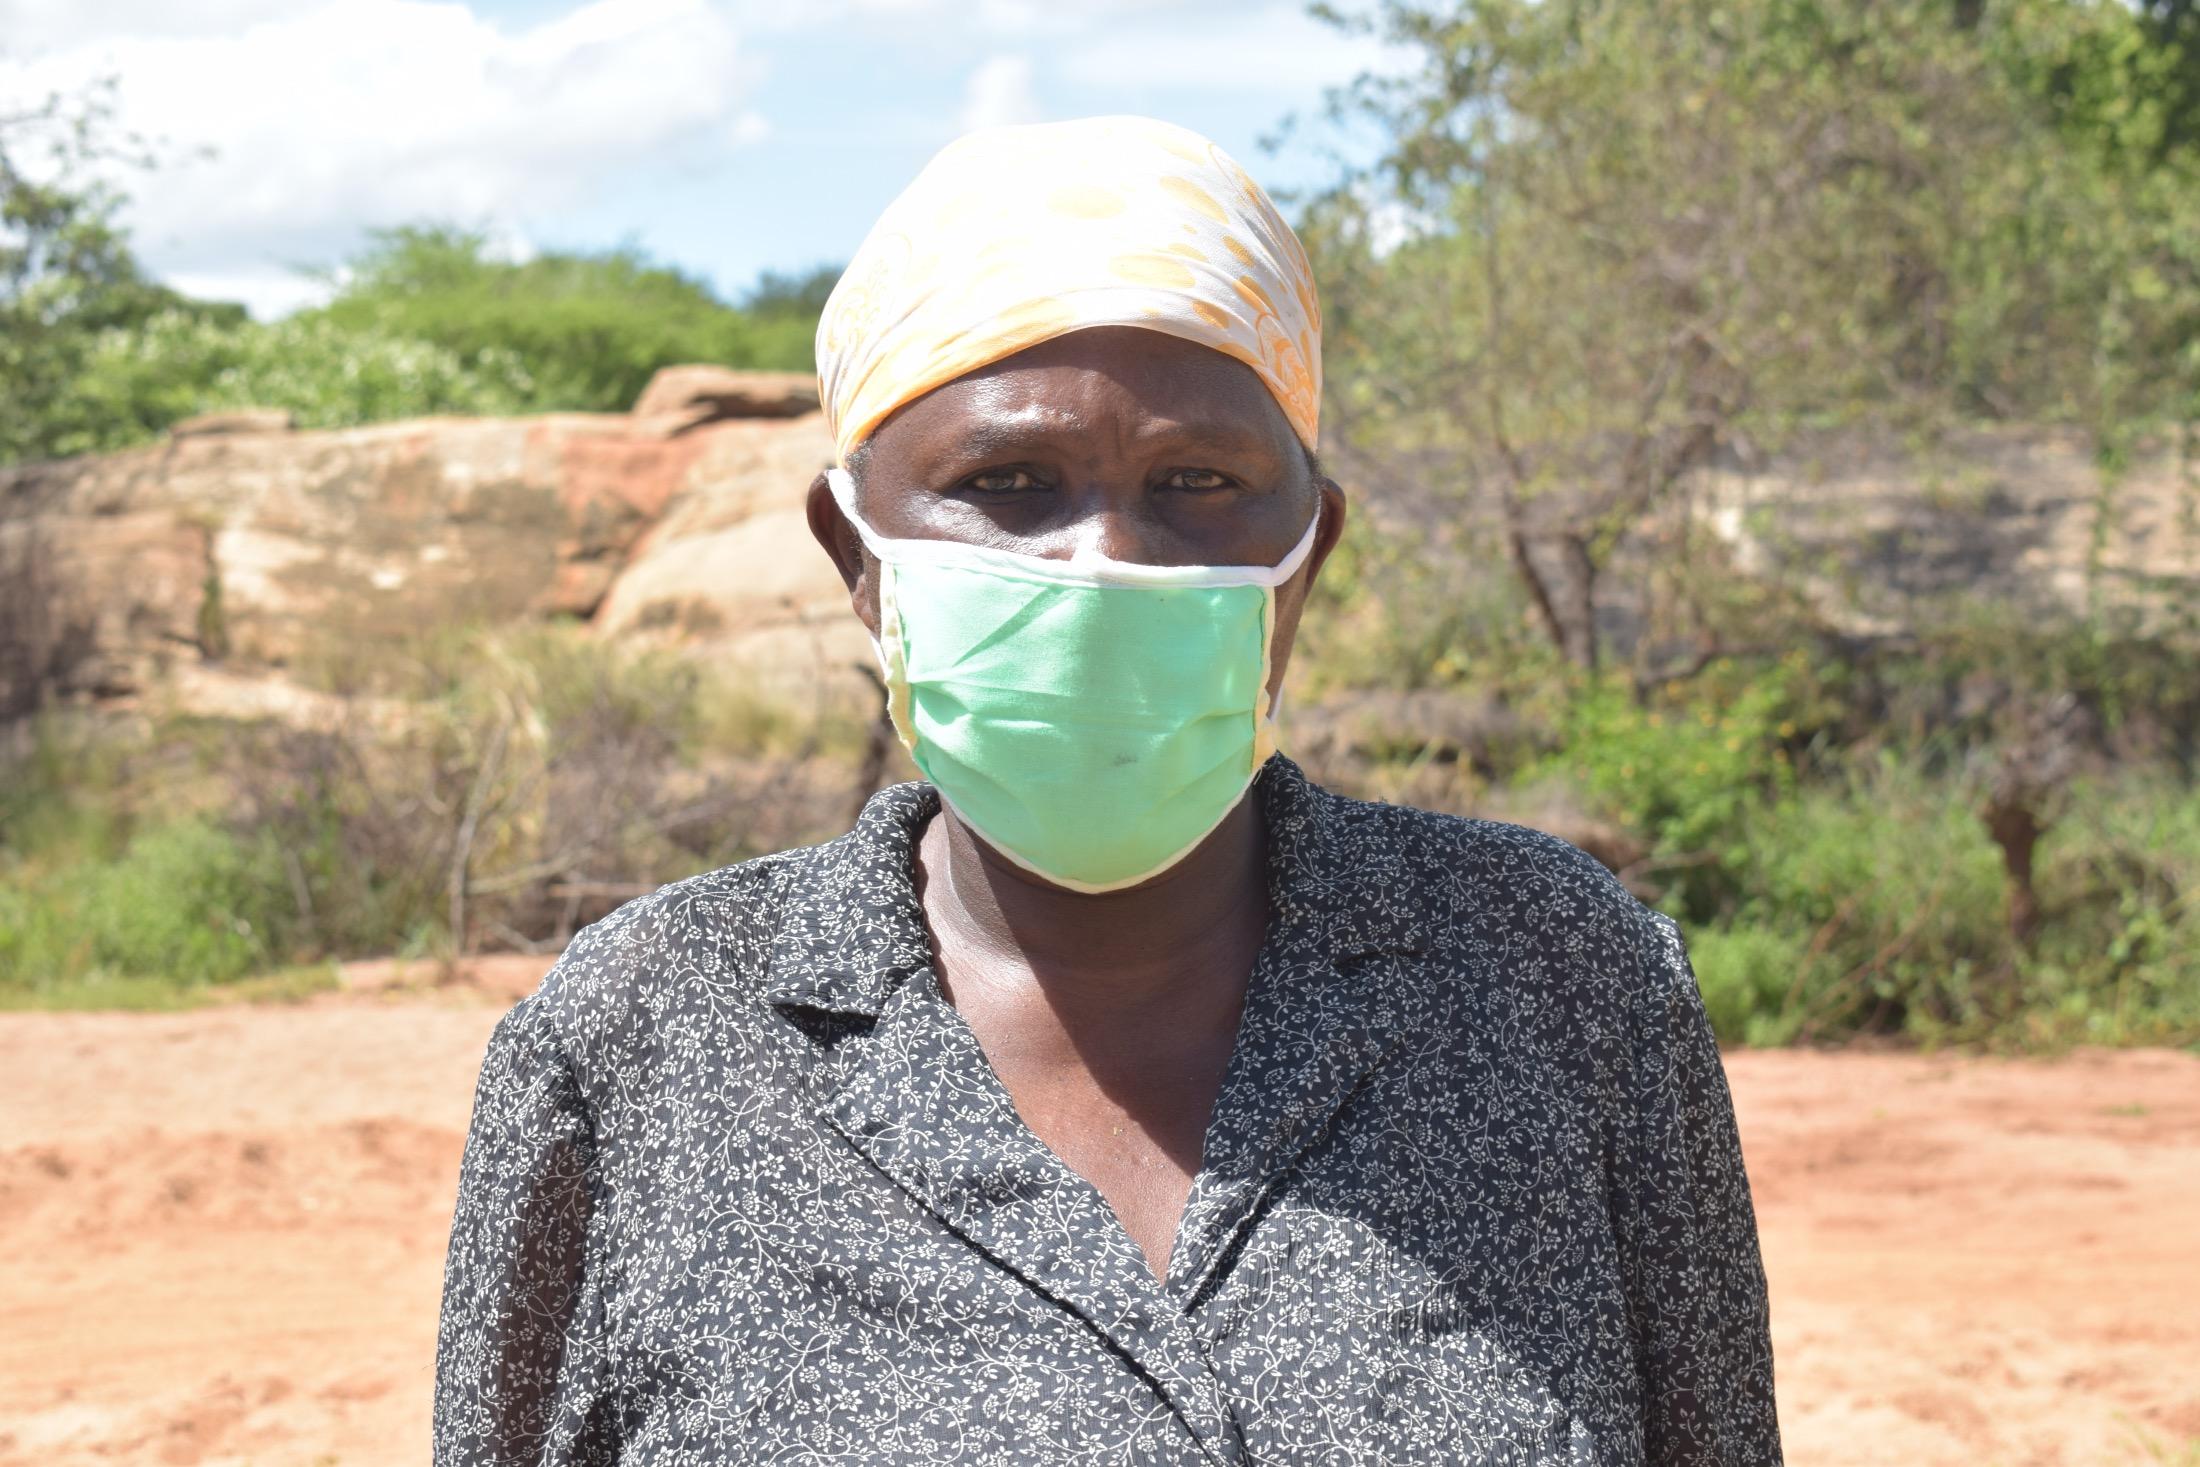 The Water Project : kenya18211-jane-maitha-56yrs-2